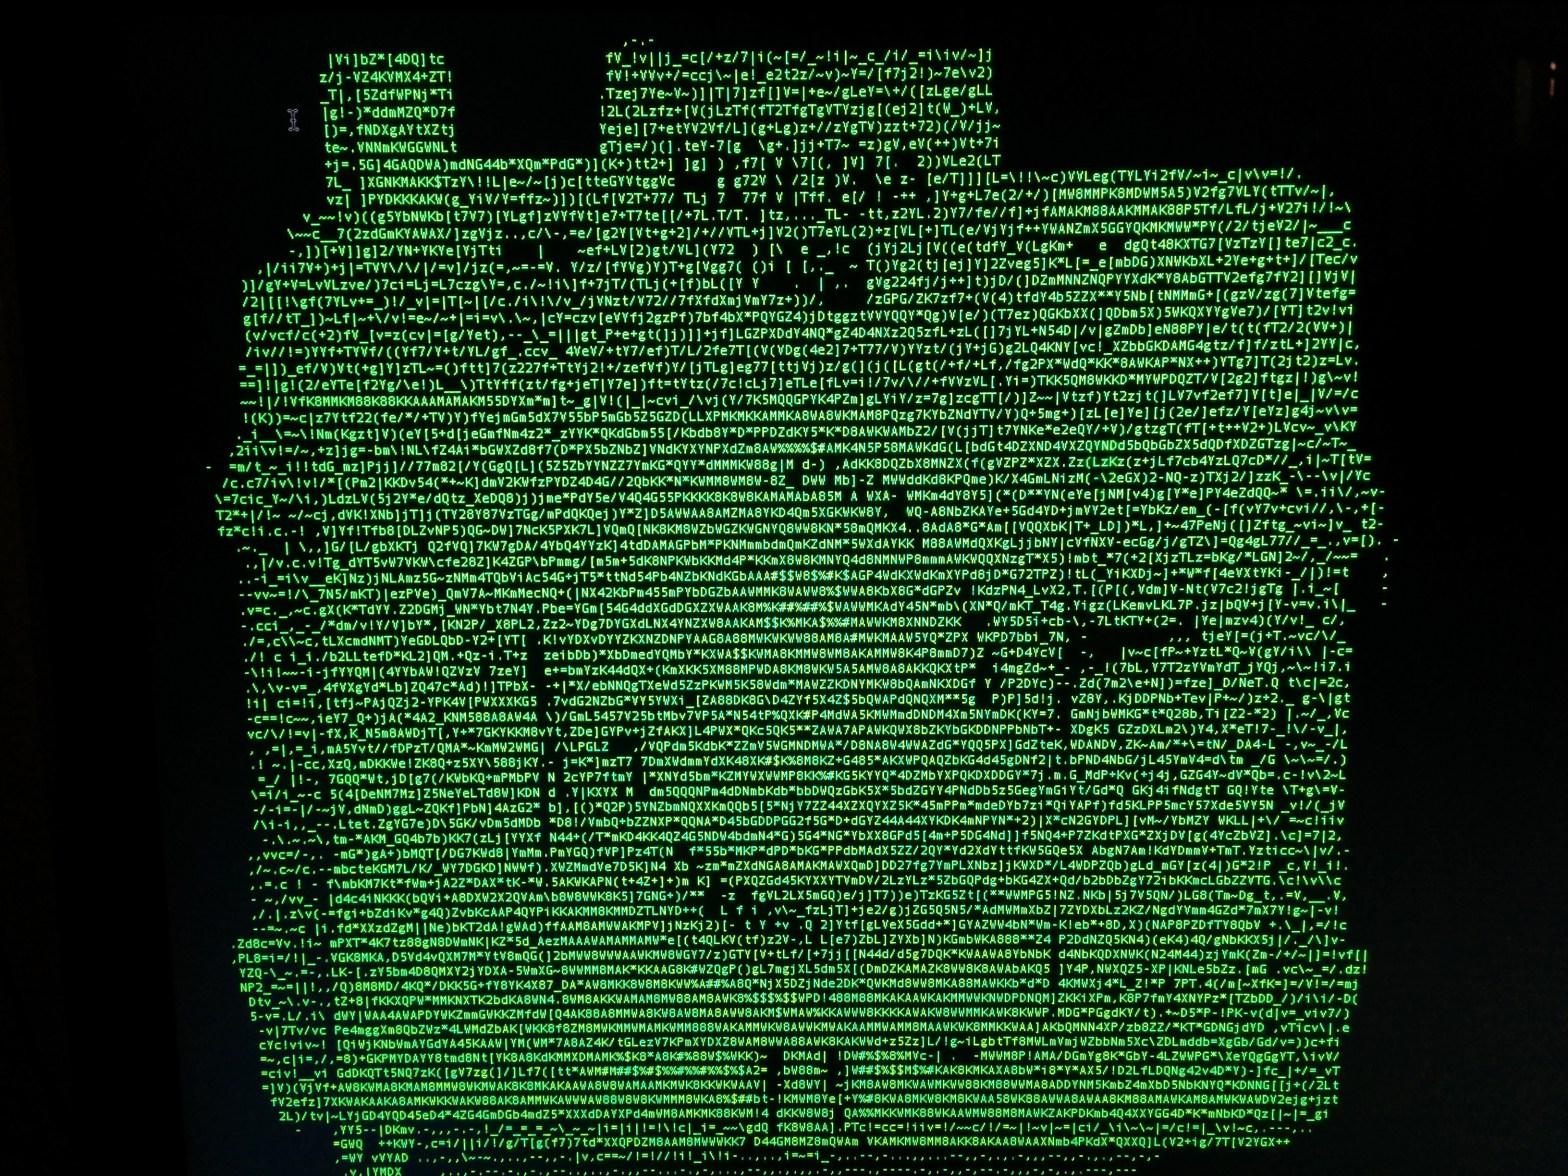 Holga 120d ASCII text image